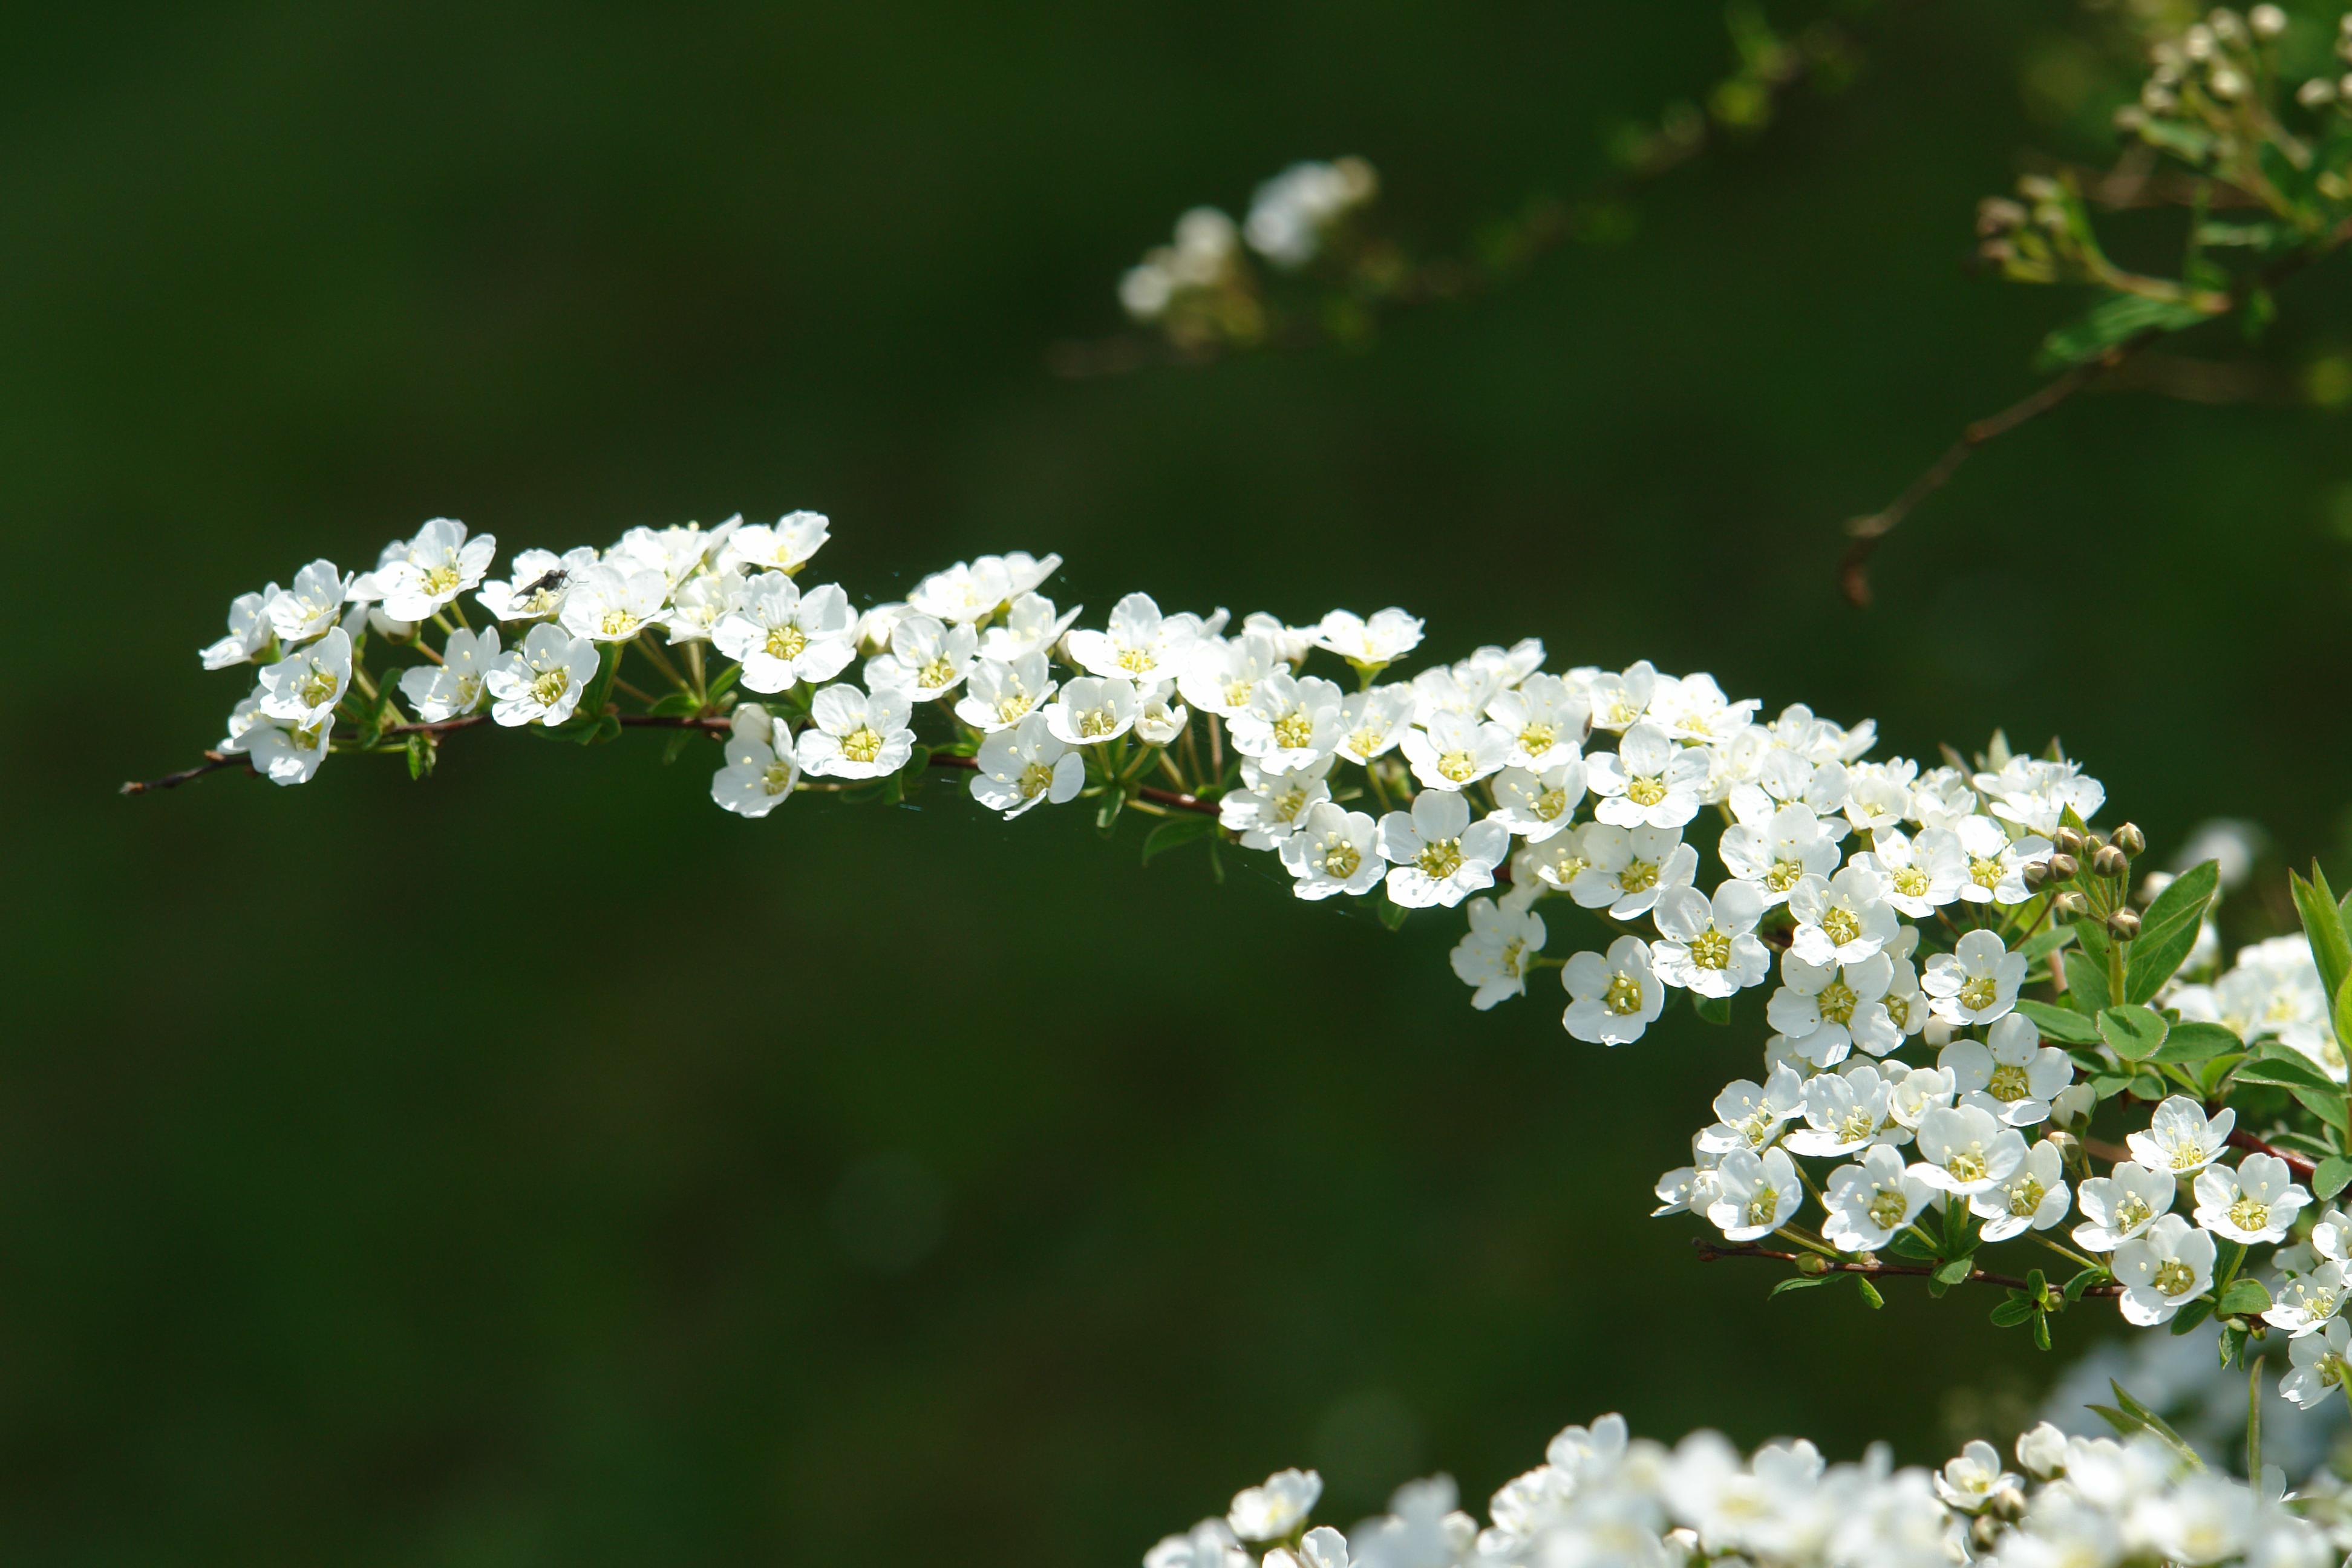 Spiraea Cinerea Grefsheim : file spiraea x cinerea 39 grefsheim 39 flowers jpg wikimedia commons ~ Orissabook.com Haus und Dekorationen